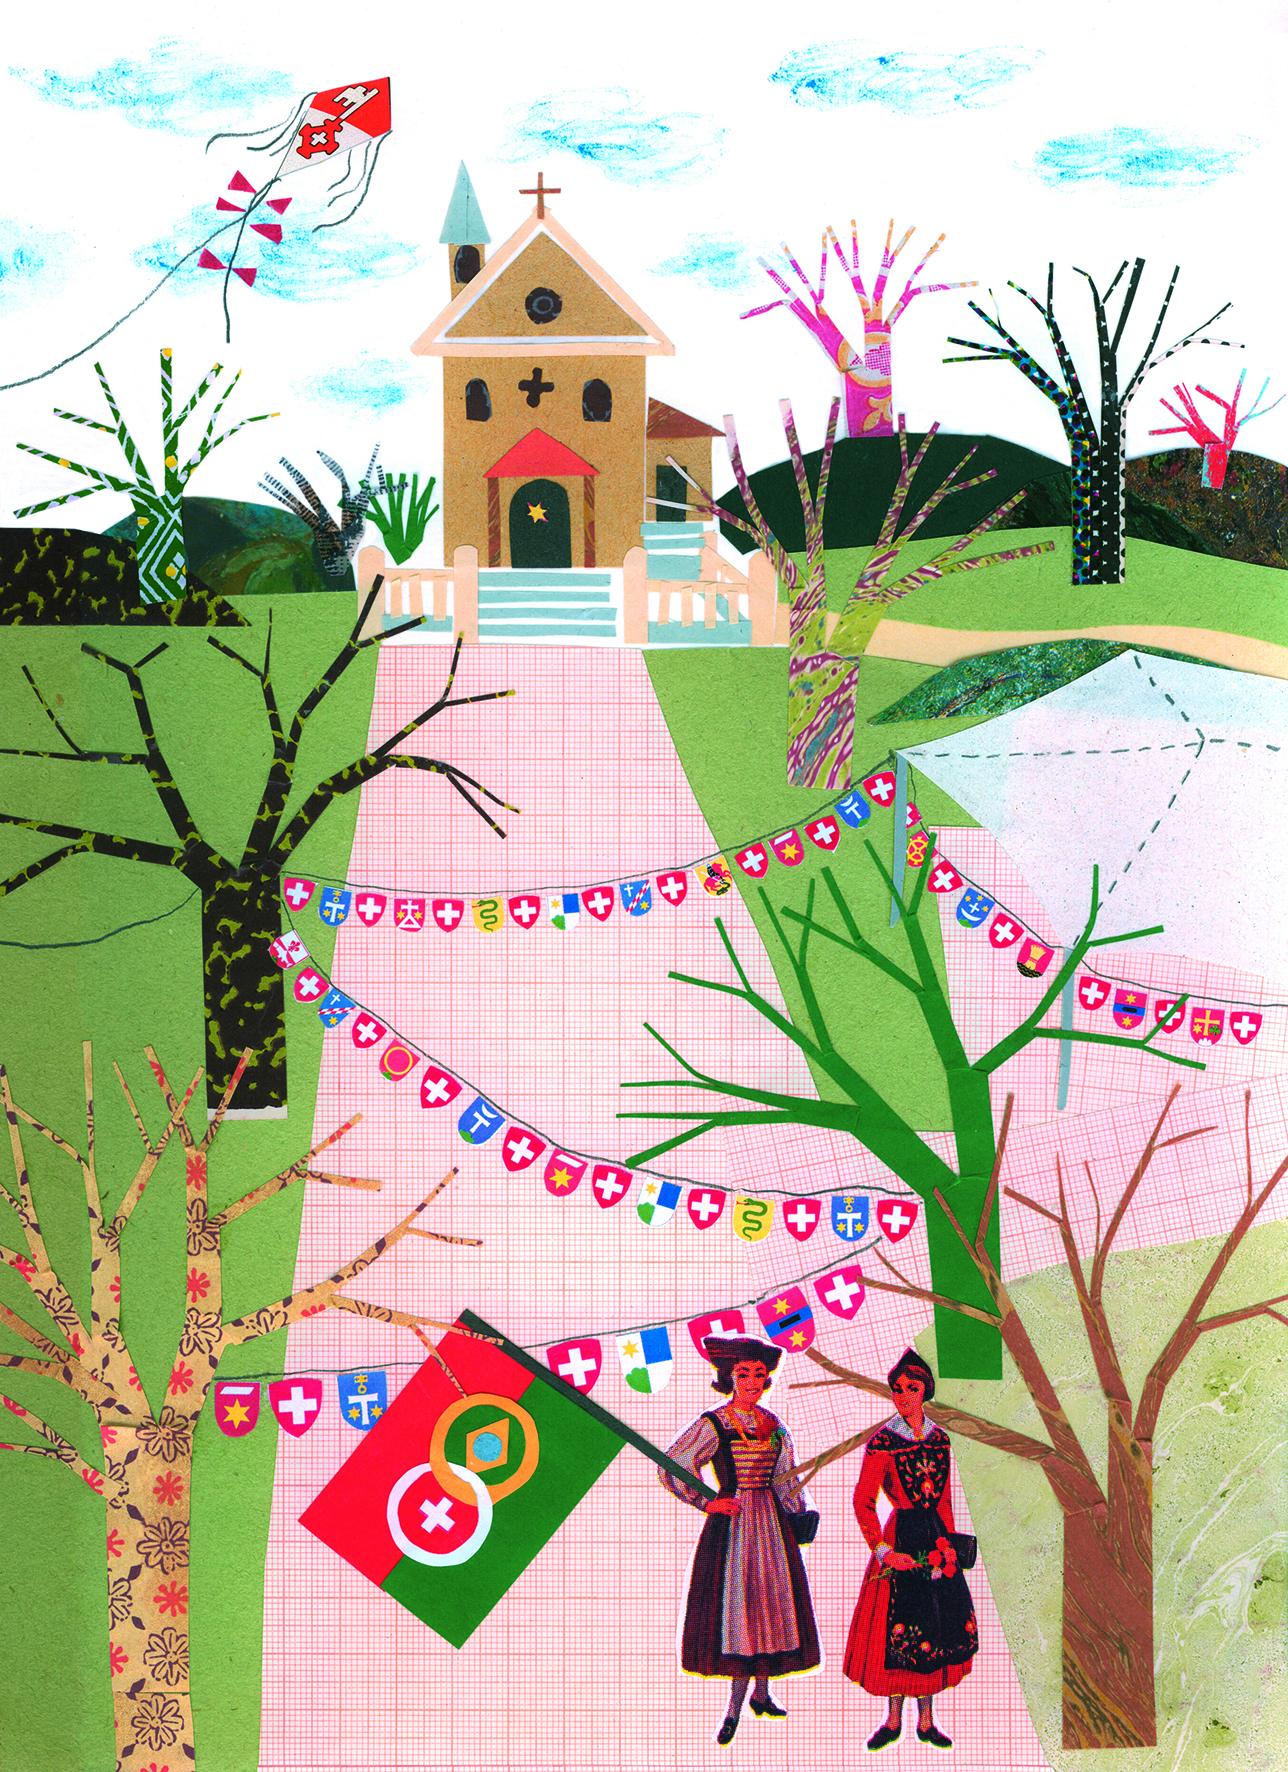 Técnica mista, por Silvia Amstalden, 2009  Acervo Silvia Amstalden